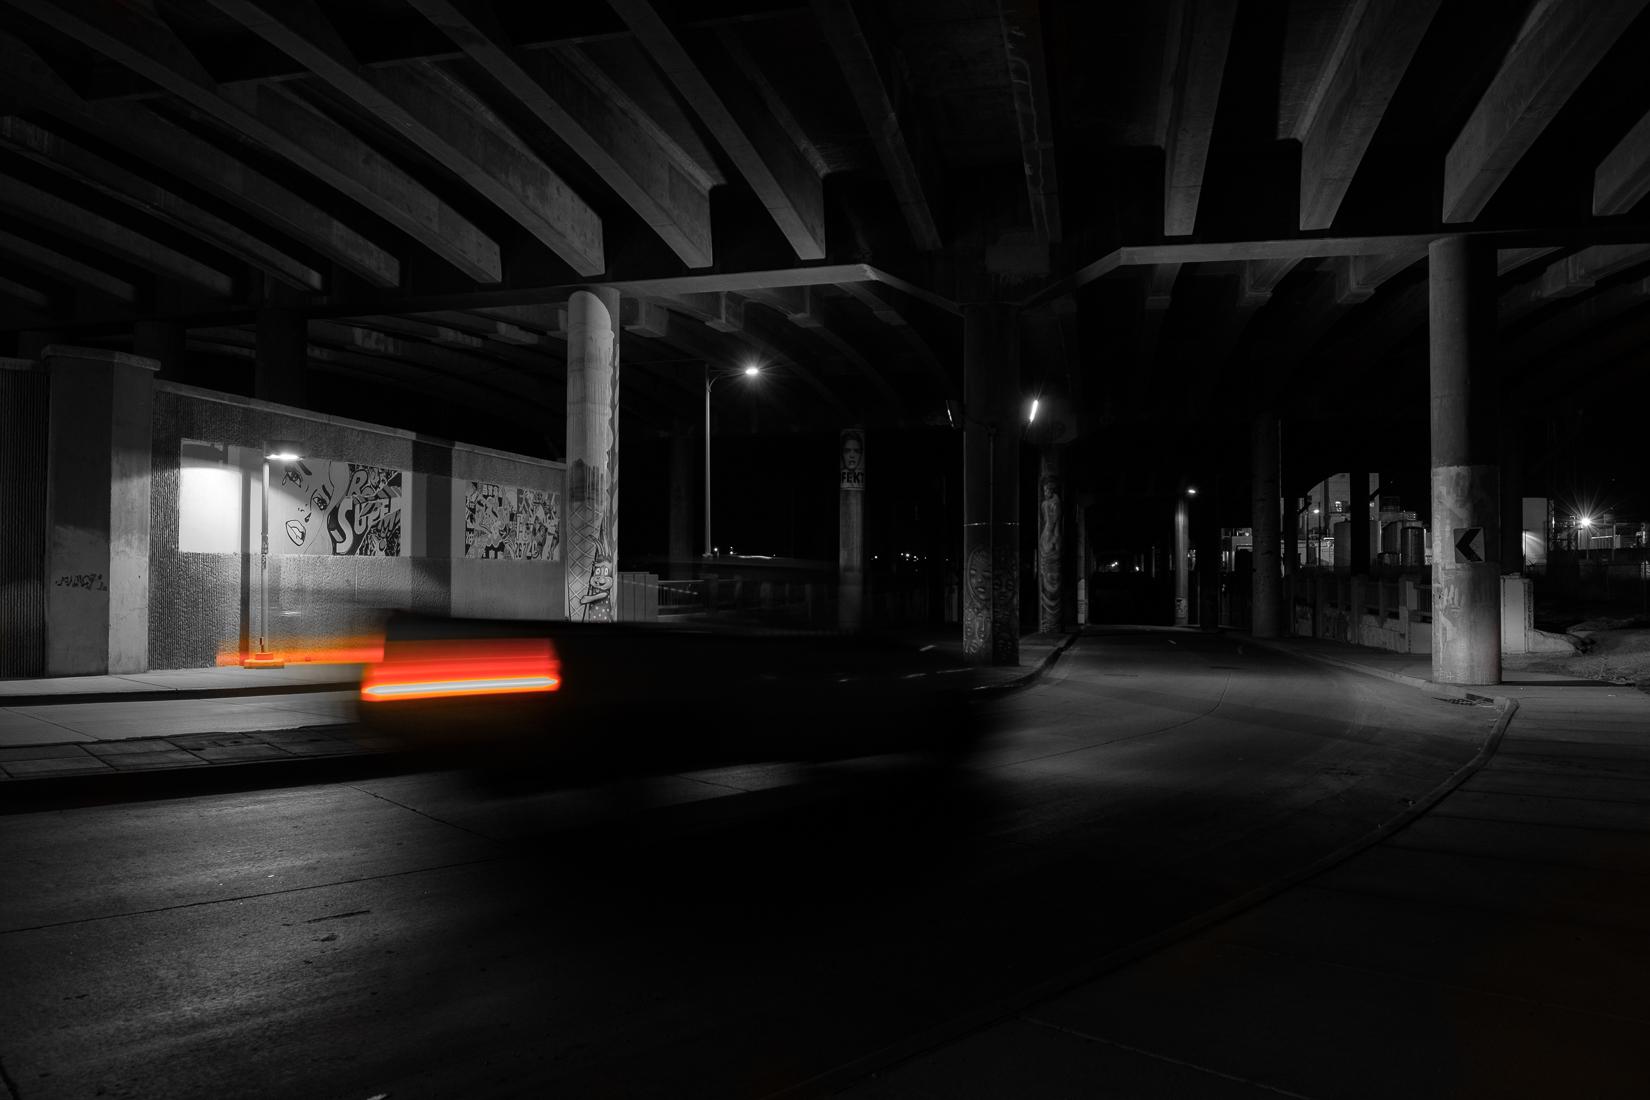 street-night-5.jpg